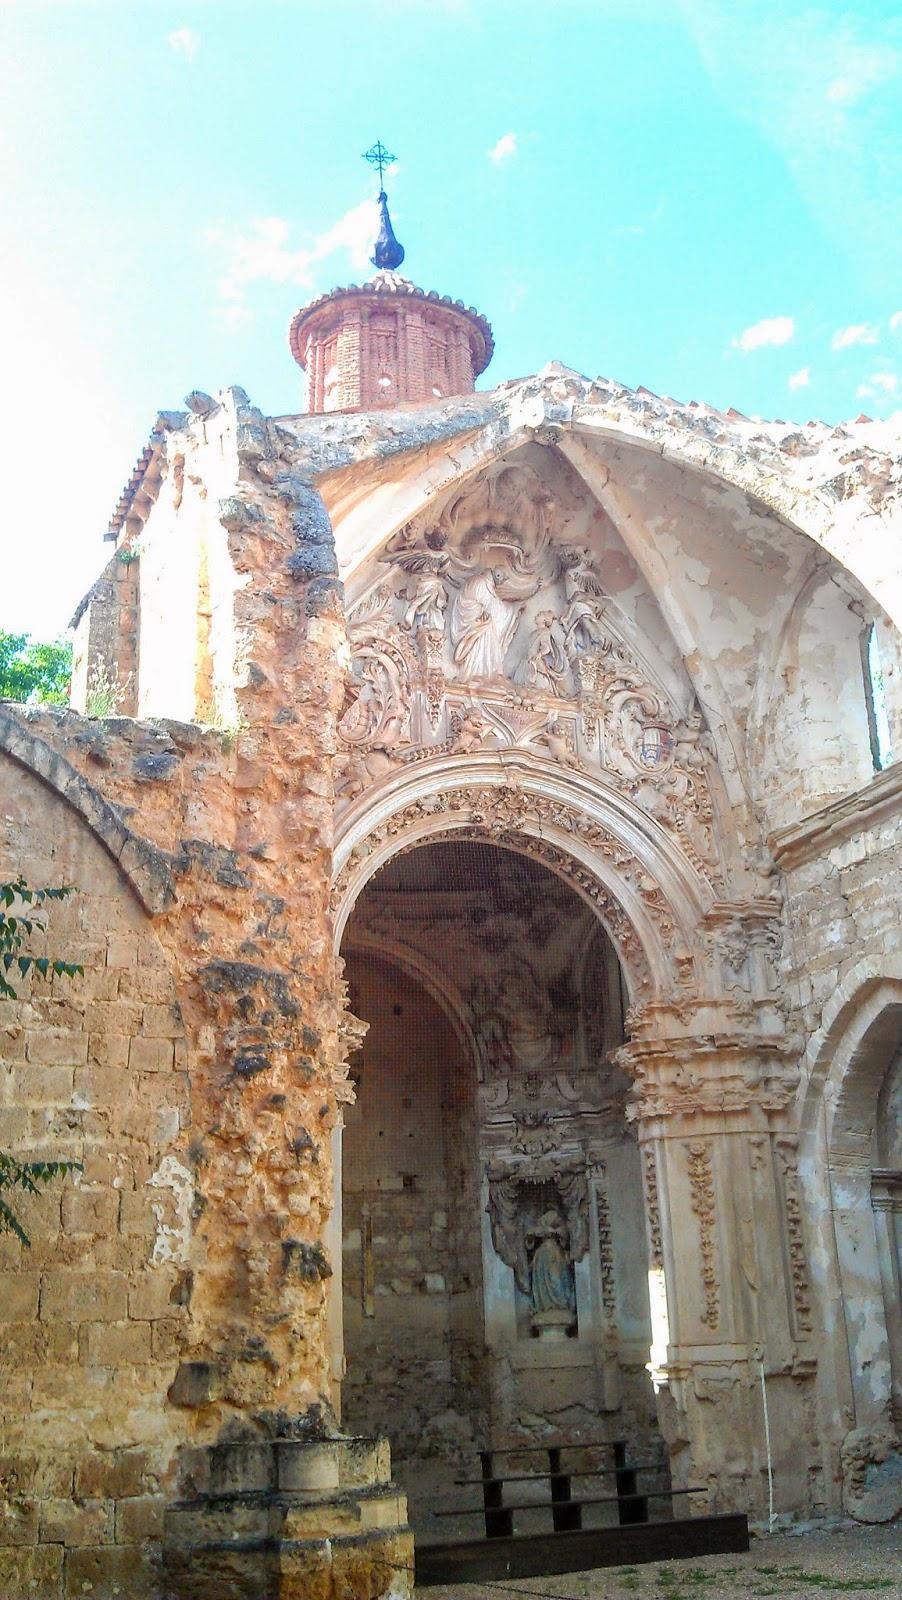 Monasterio Cisterciense. Guía de turismo del Monasterio de Piedra. Tu Maleta.